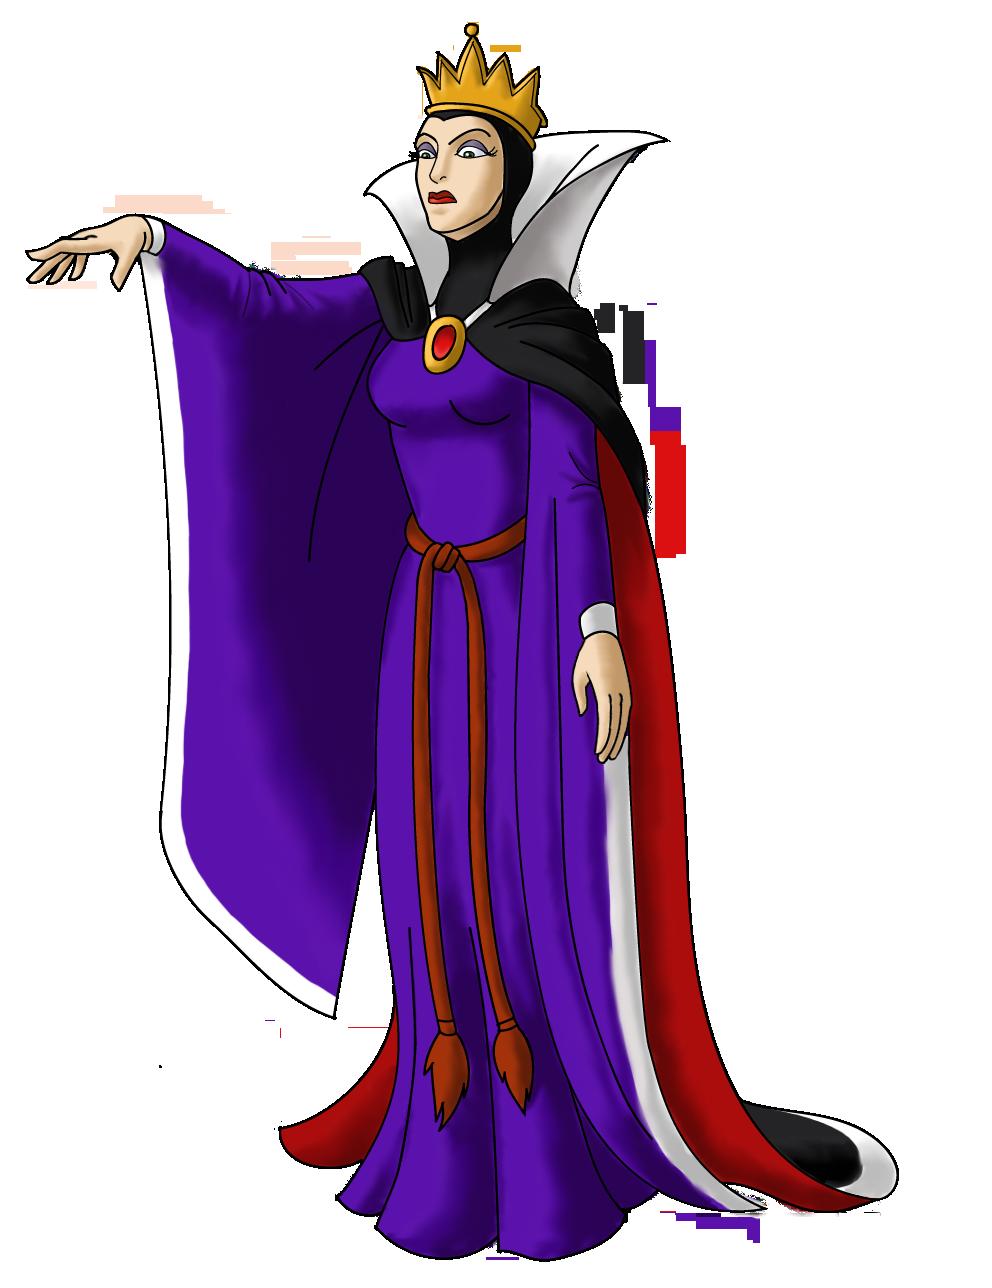 Queen clipart evil queen. Download hd hq png